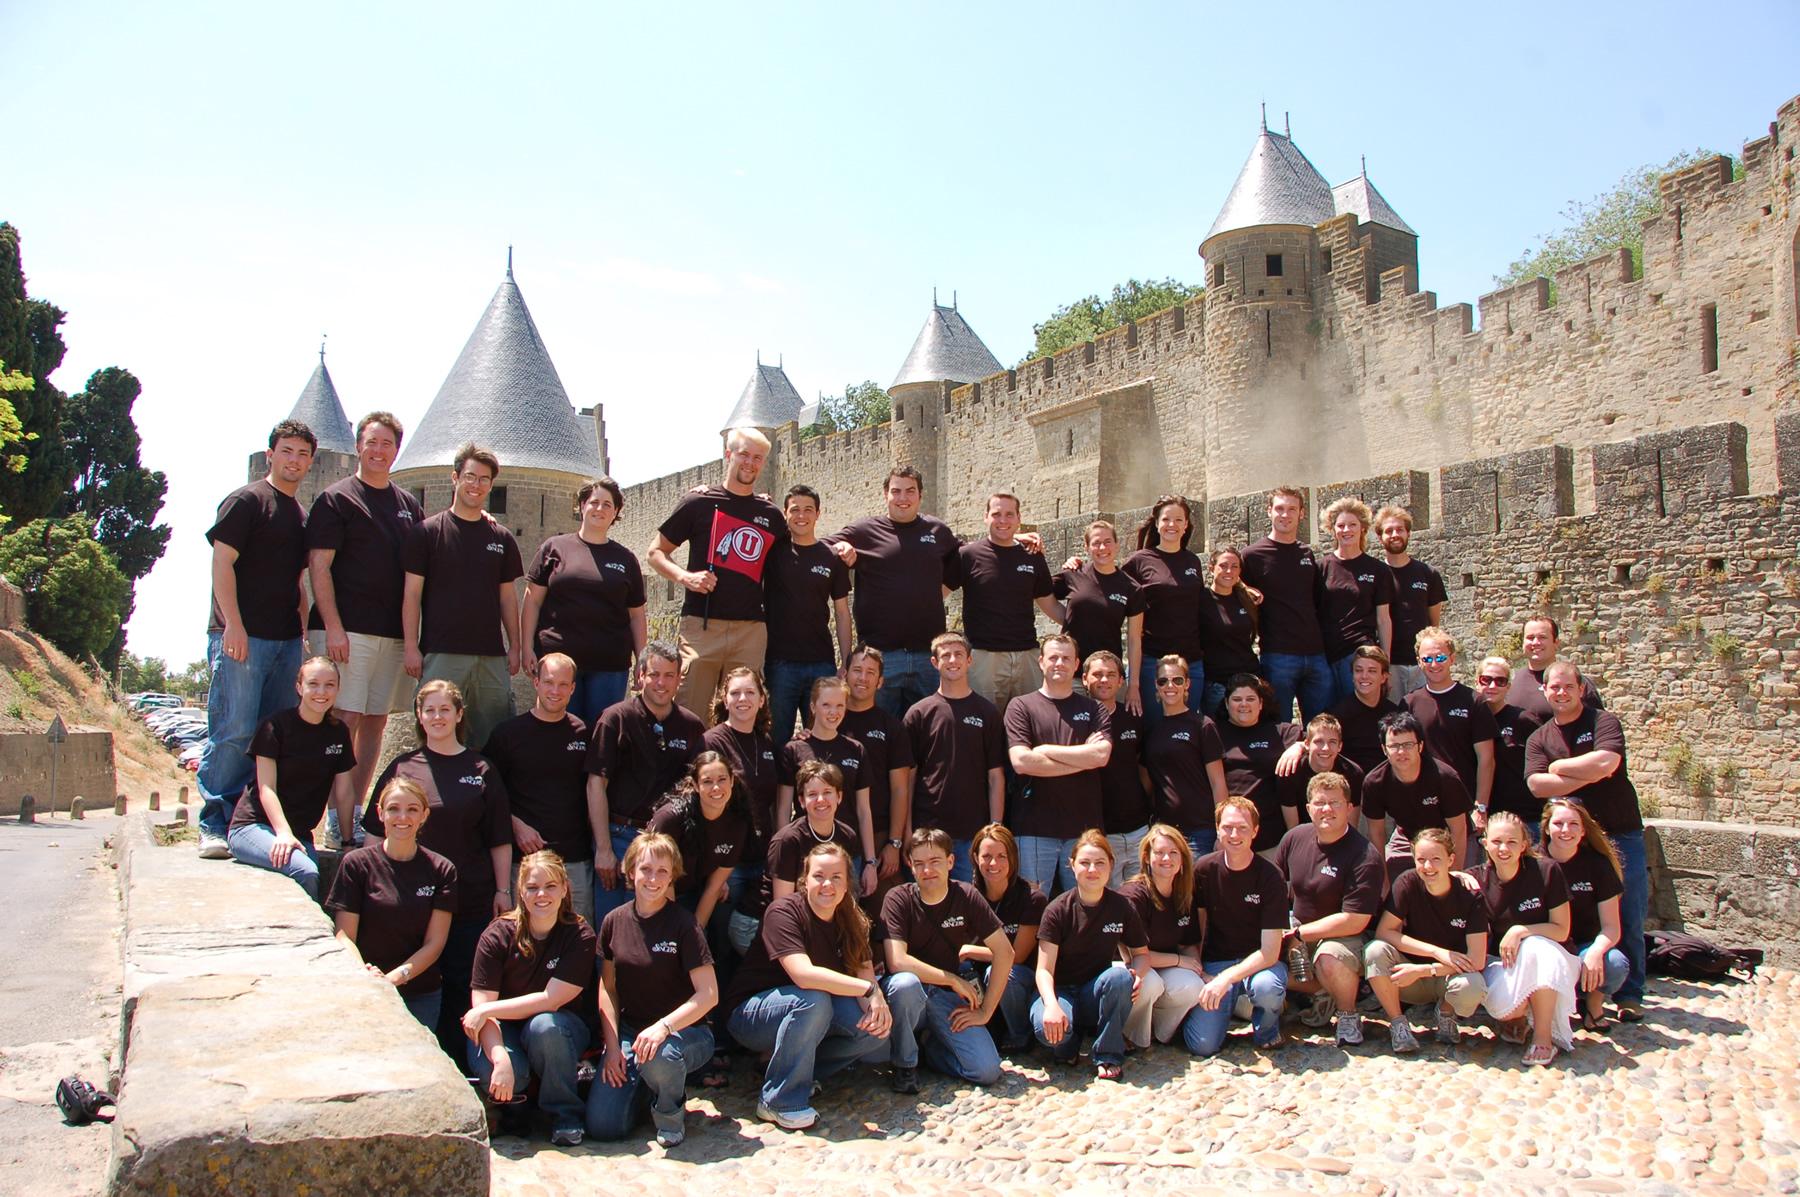 University of Utah Singers in Carcassonne, France